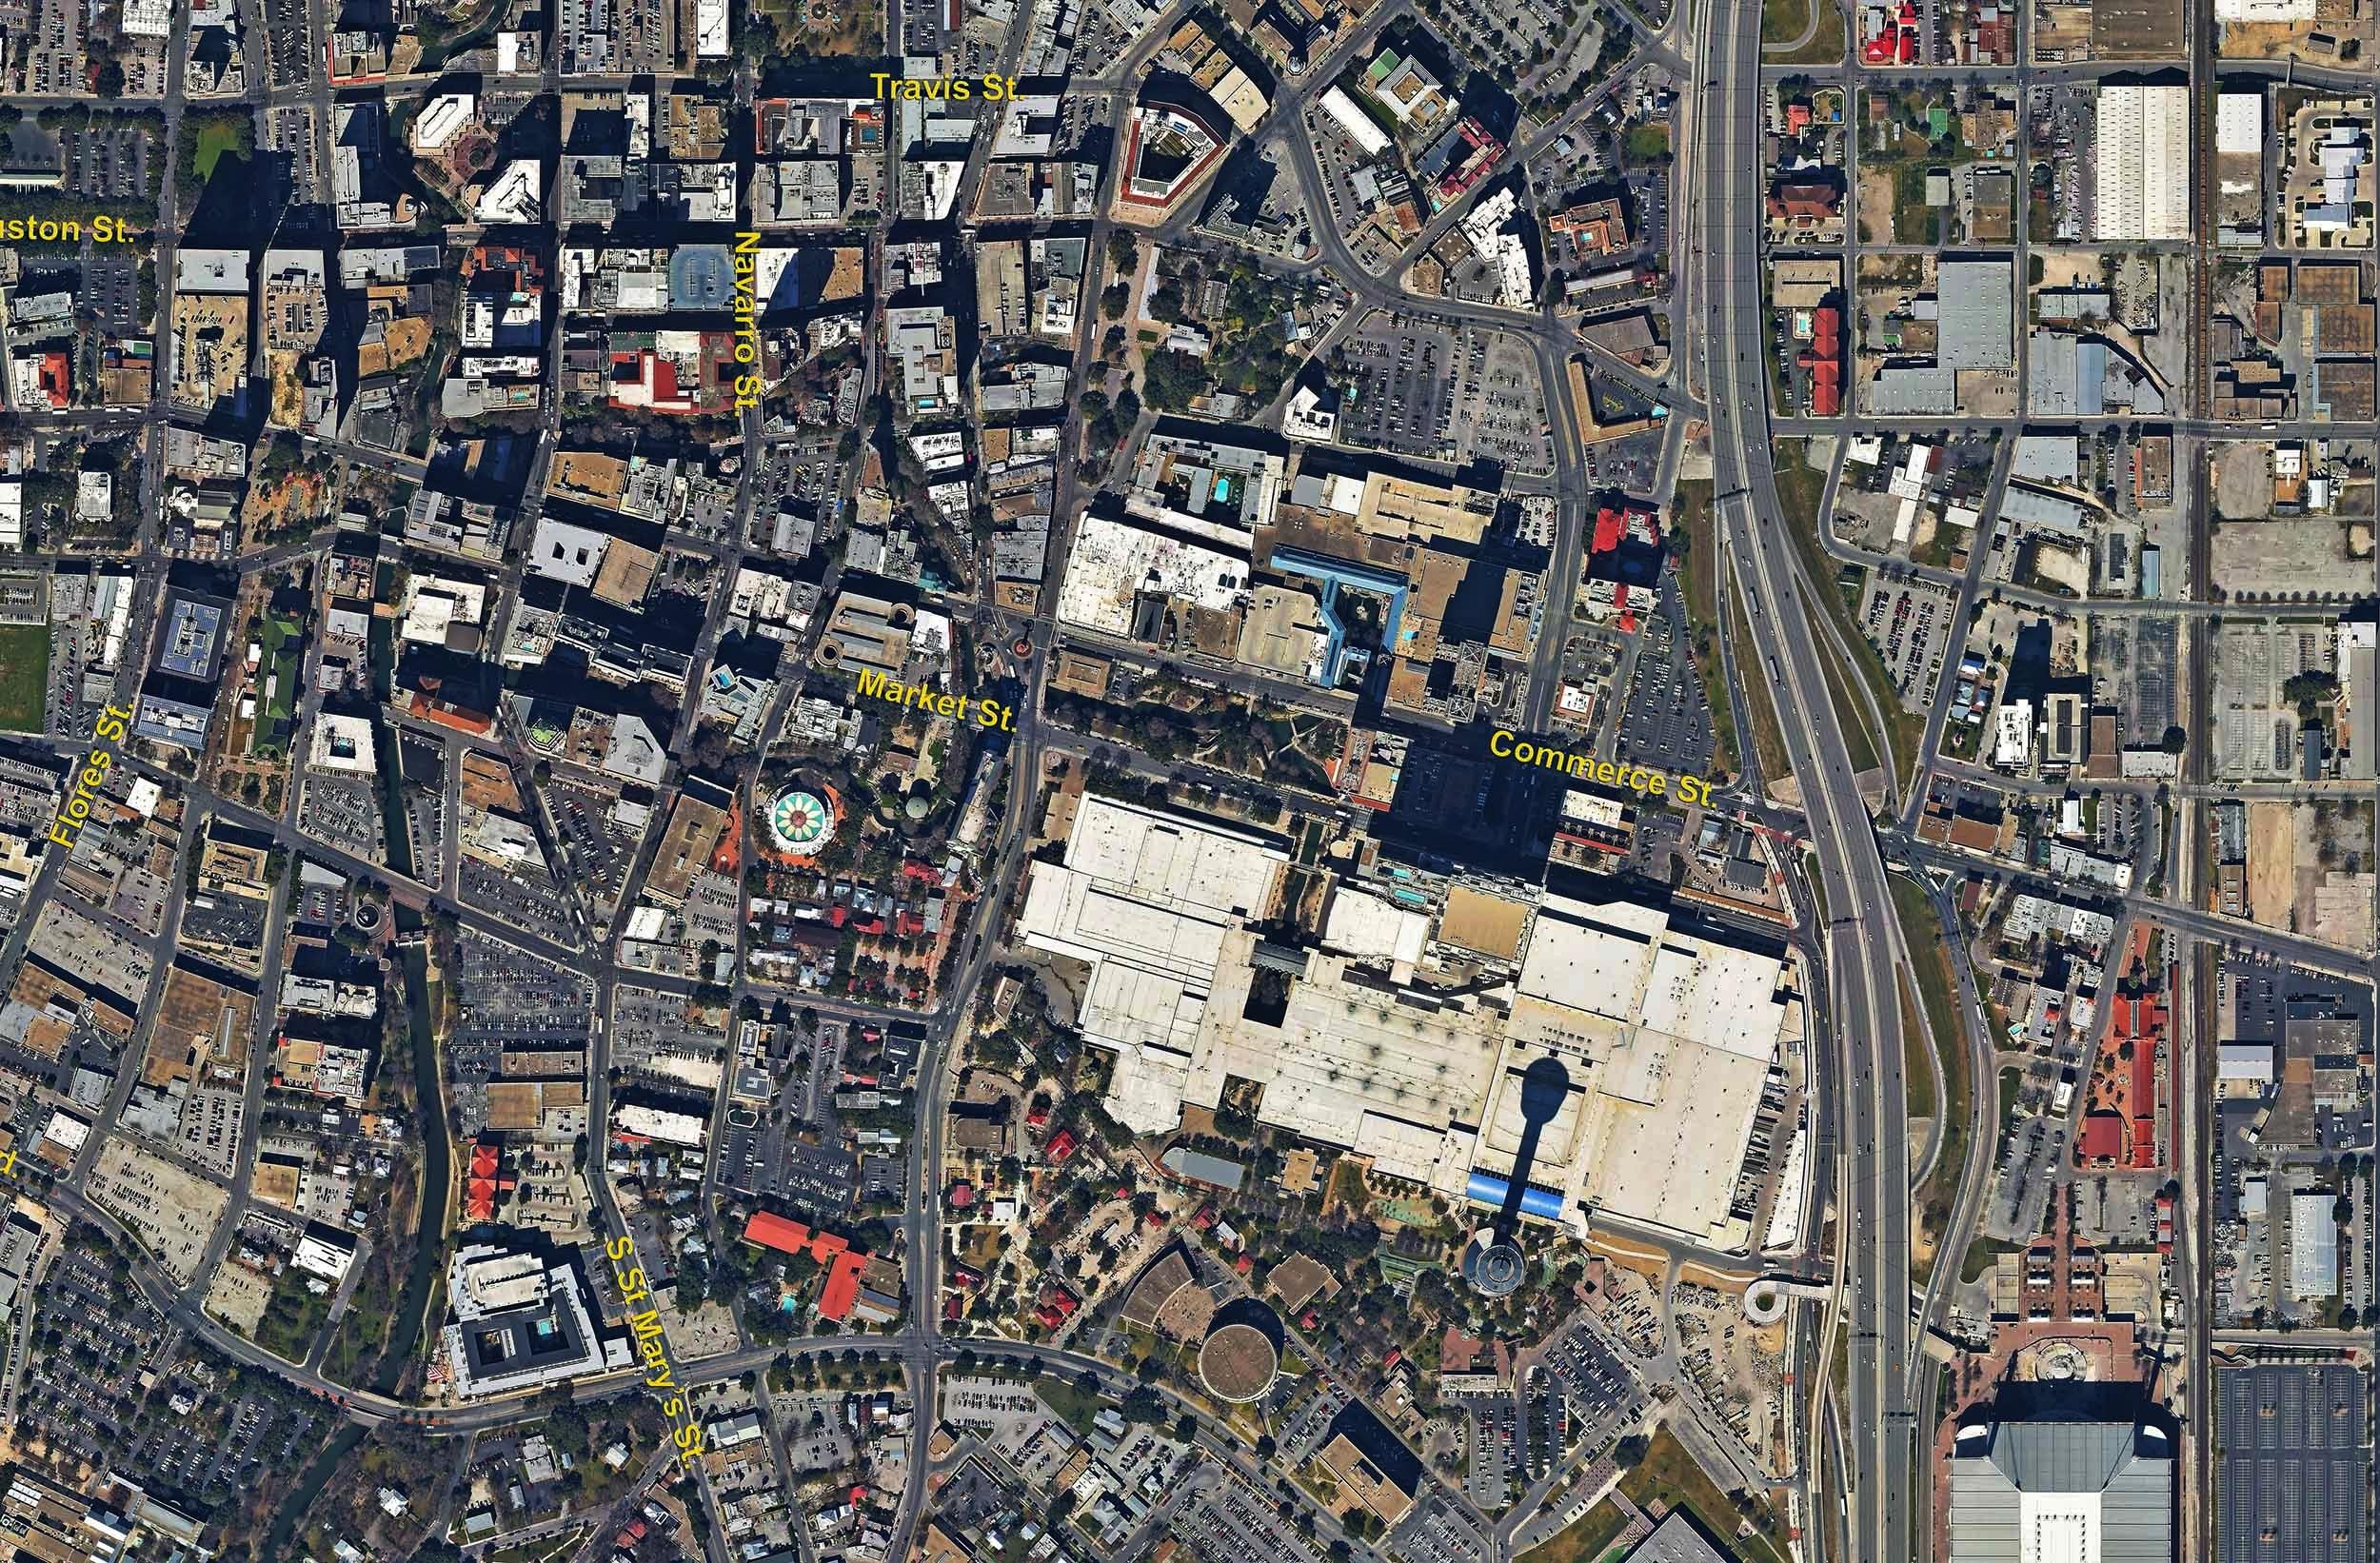 CBD Vertical Image, San Antonio, Texas - San Antonio Aerial Photography - San Antonio Vertical Drone Photography - San Antonio, TX